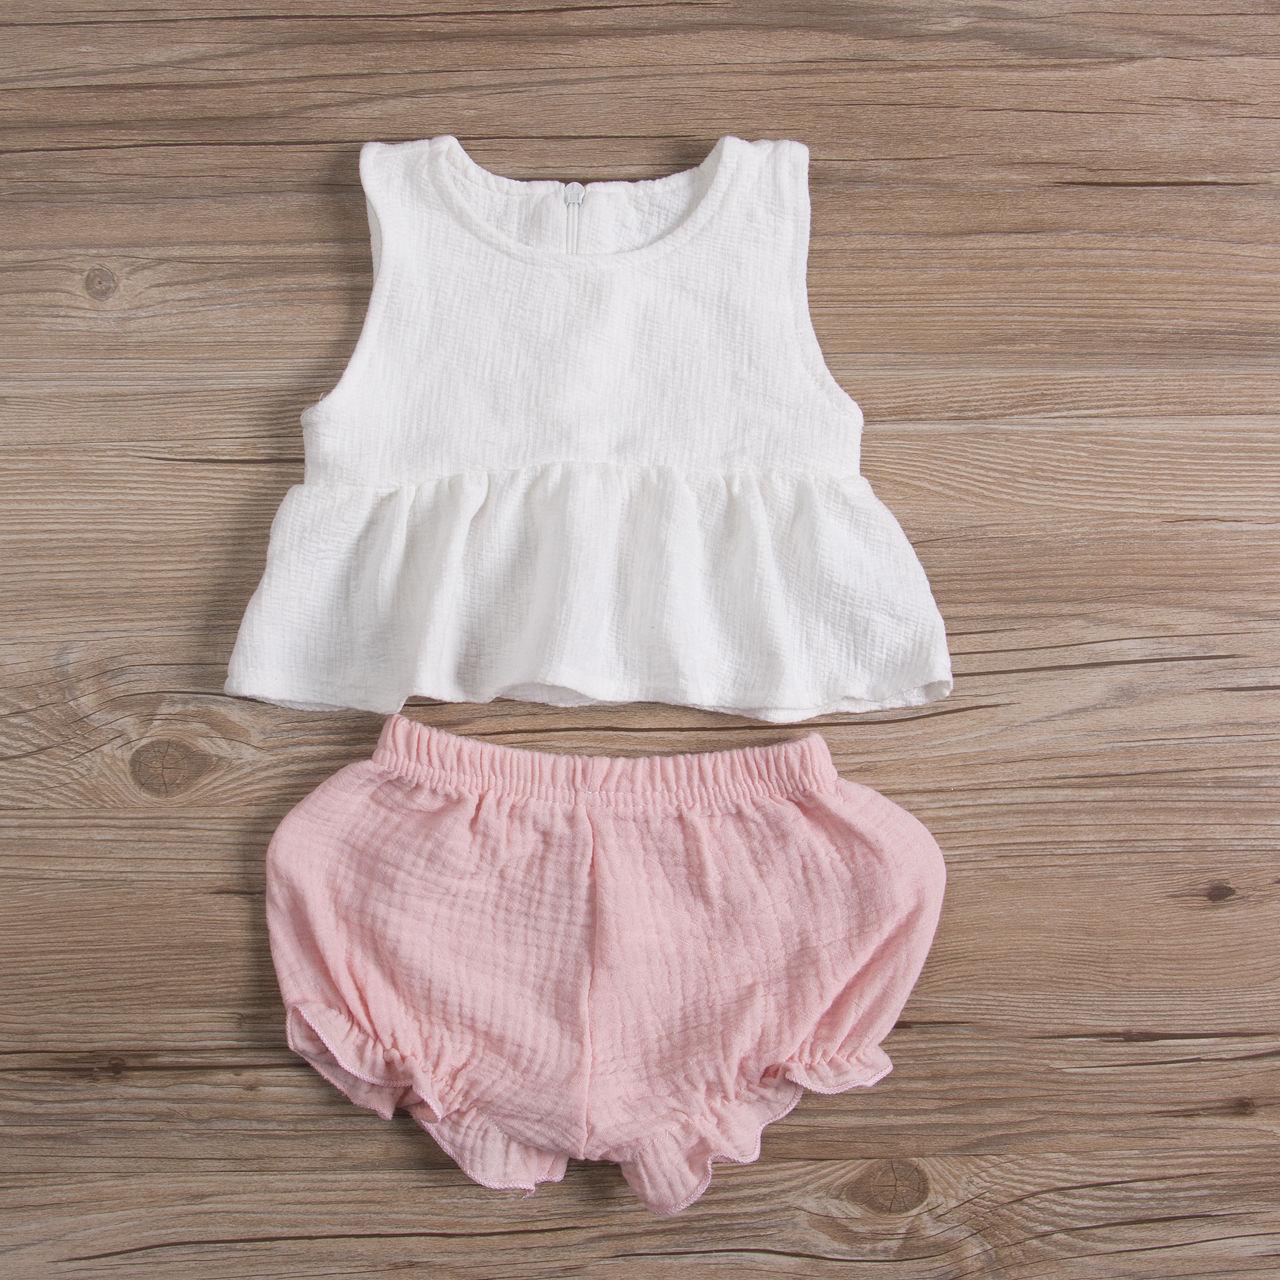 Toddler Kids Baby Girls Summer Princess Clothes Sleeveless T-shirt Tops+Pink Short Pants Outfit 2PCS Set